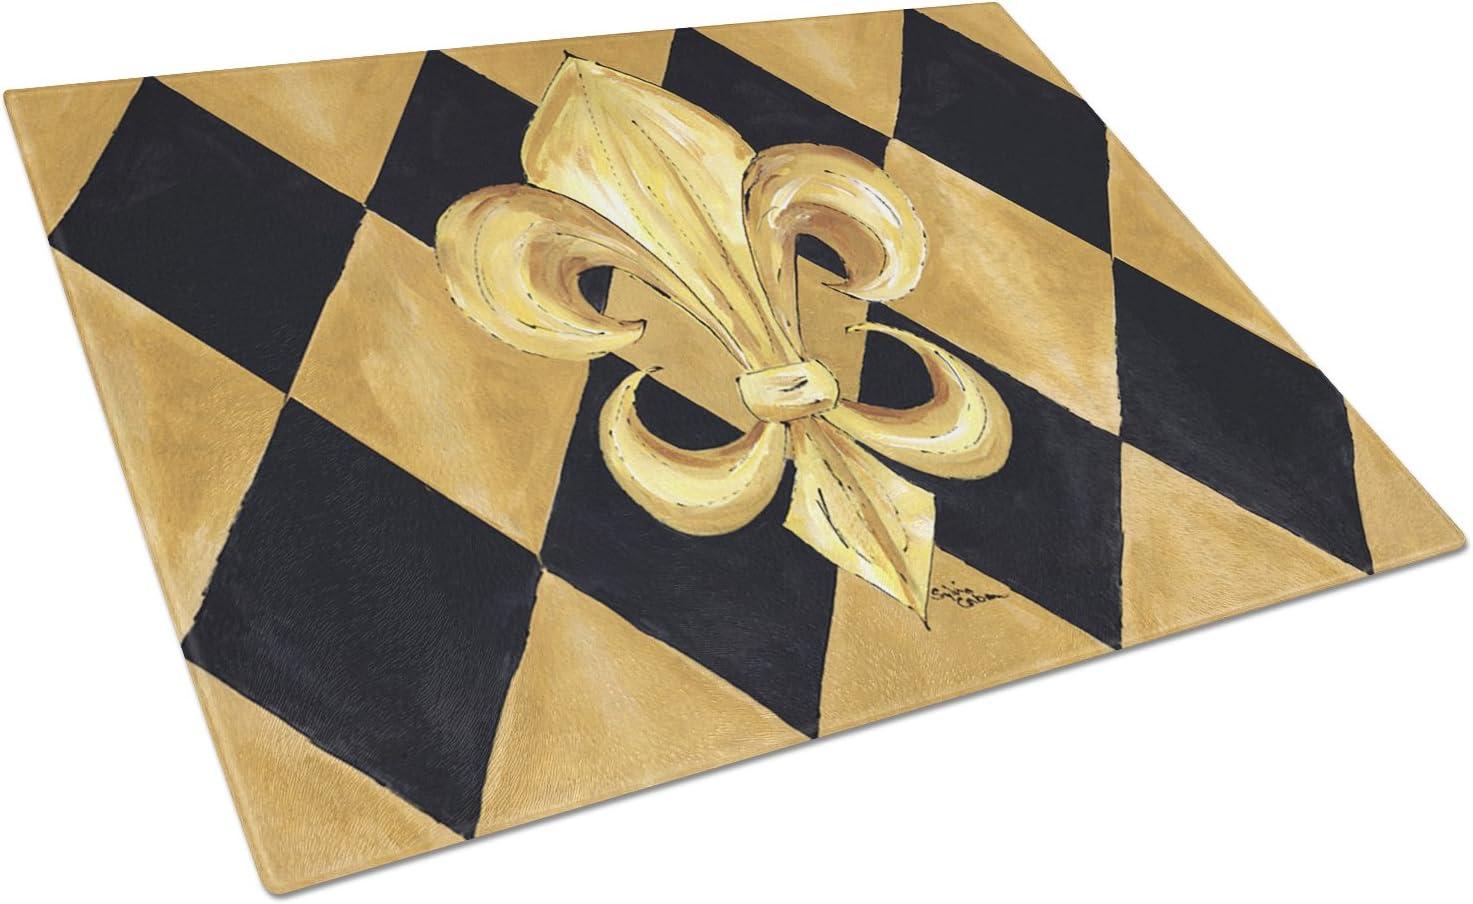 Caroline's Treasures Special sale item 8125LCB Black Branded goods and Gold Fleur New de Orl lis